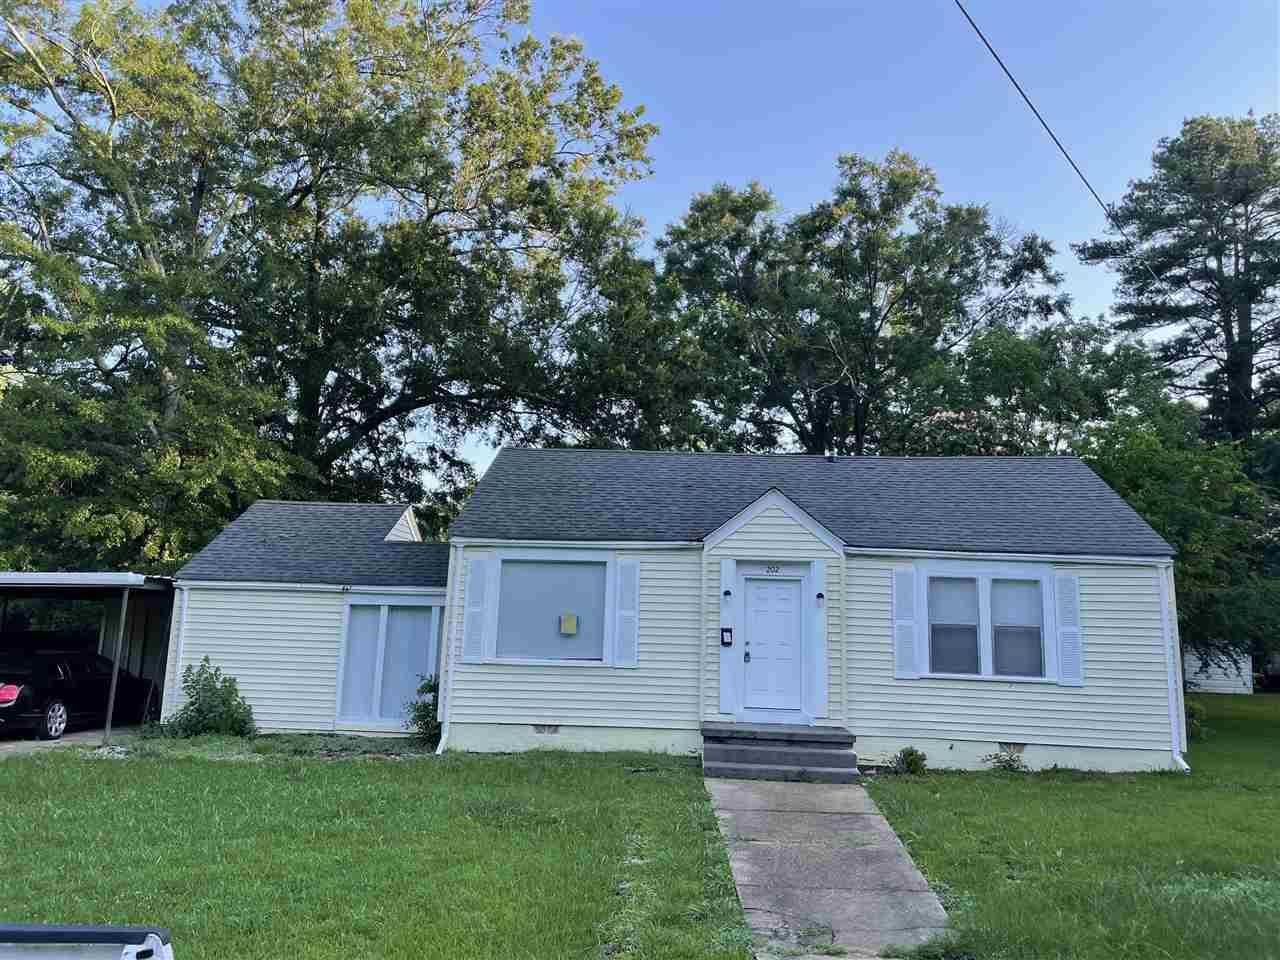 202 CONTI ST, Jackson, MS 39206 - MLS#: 341484